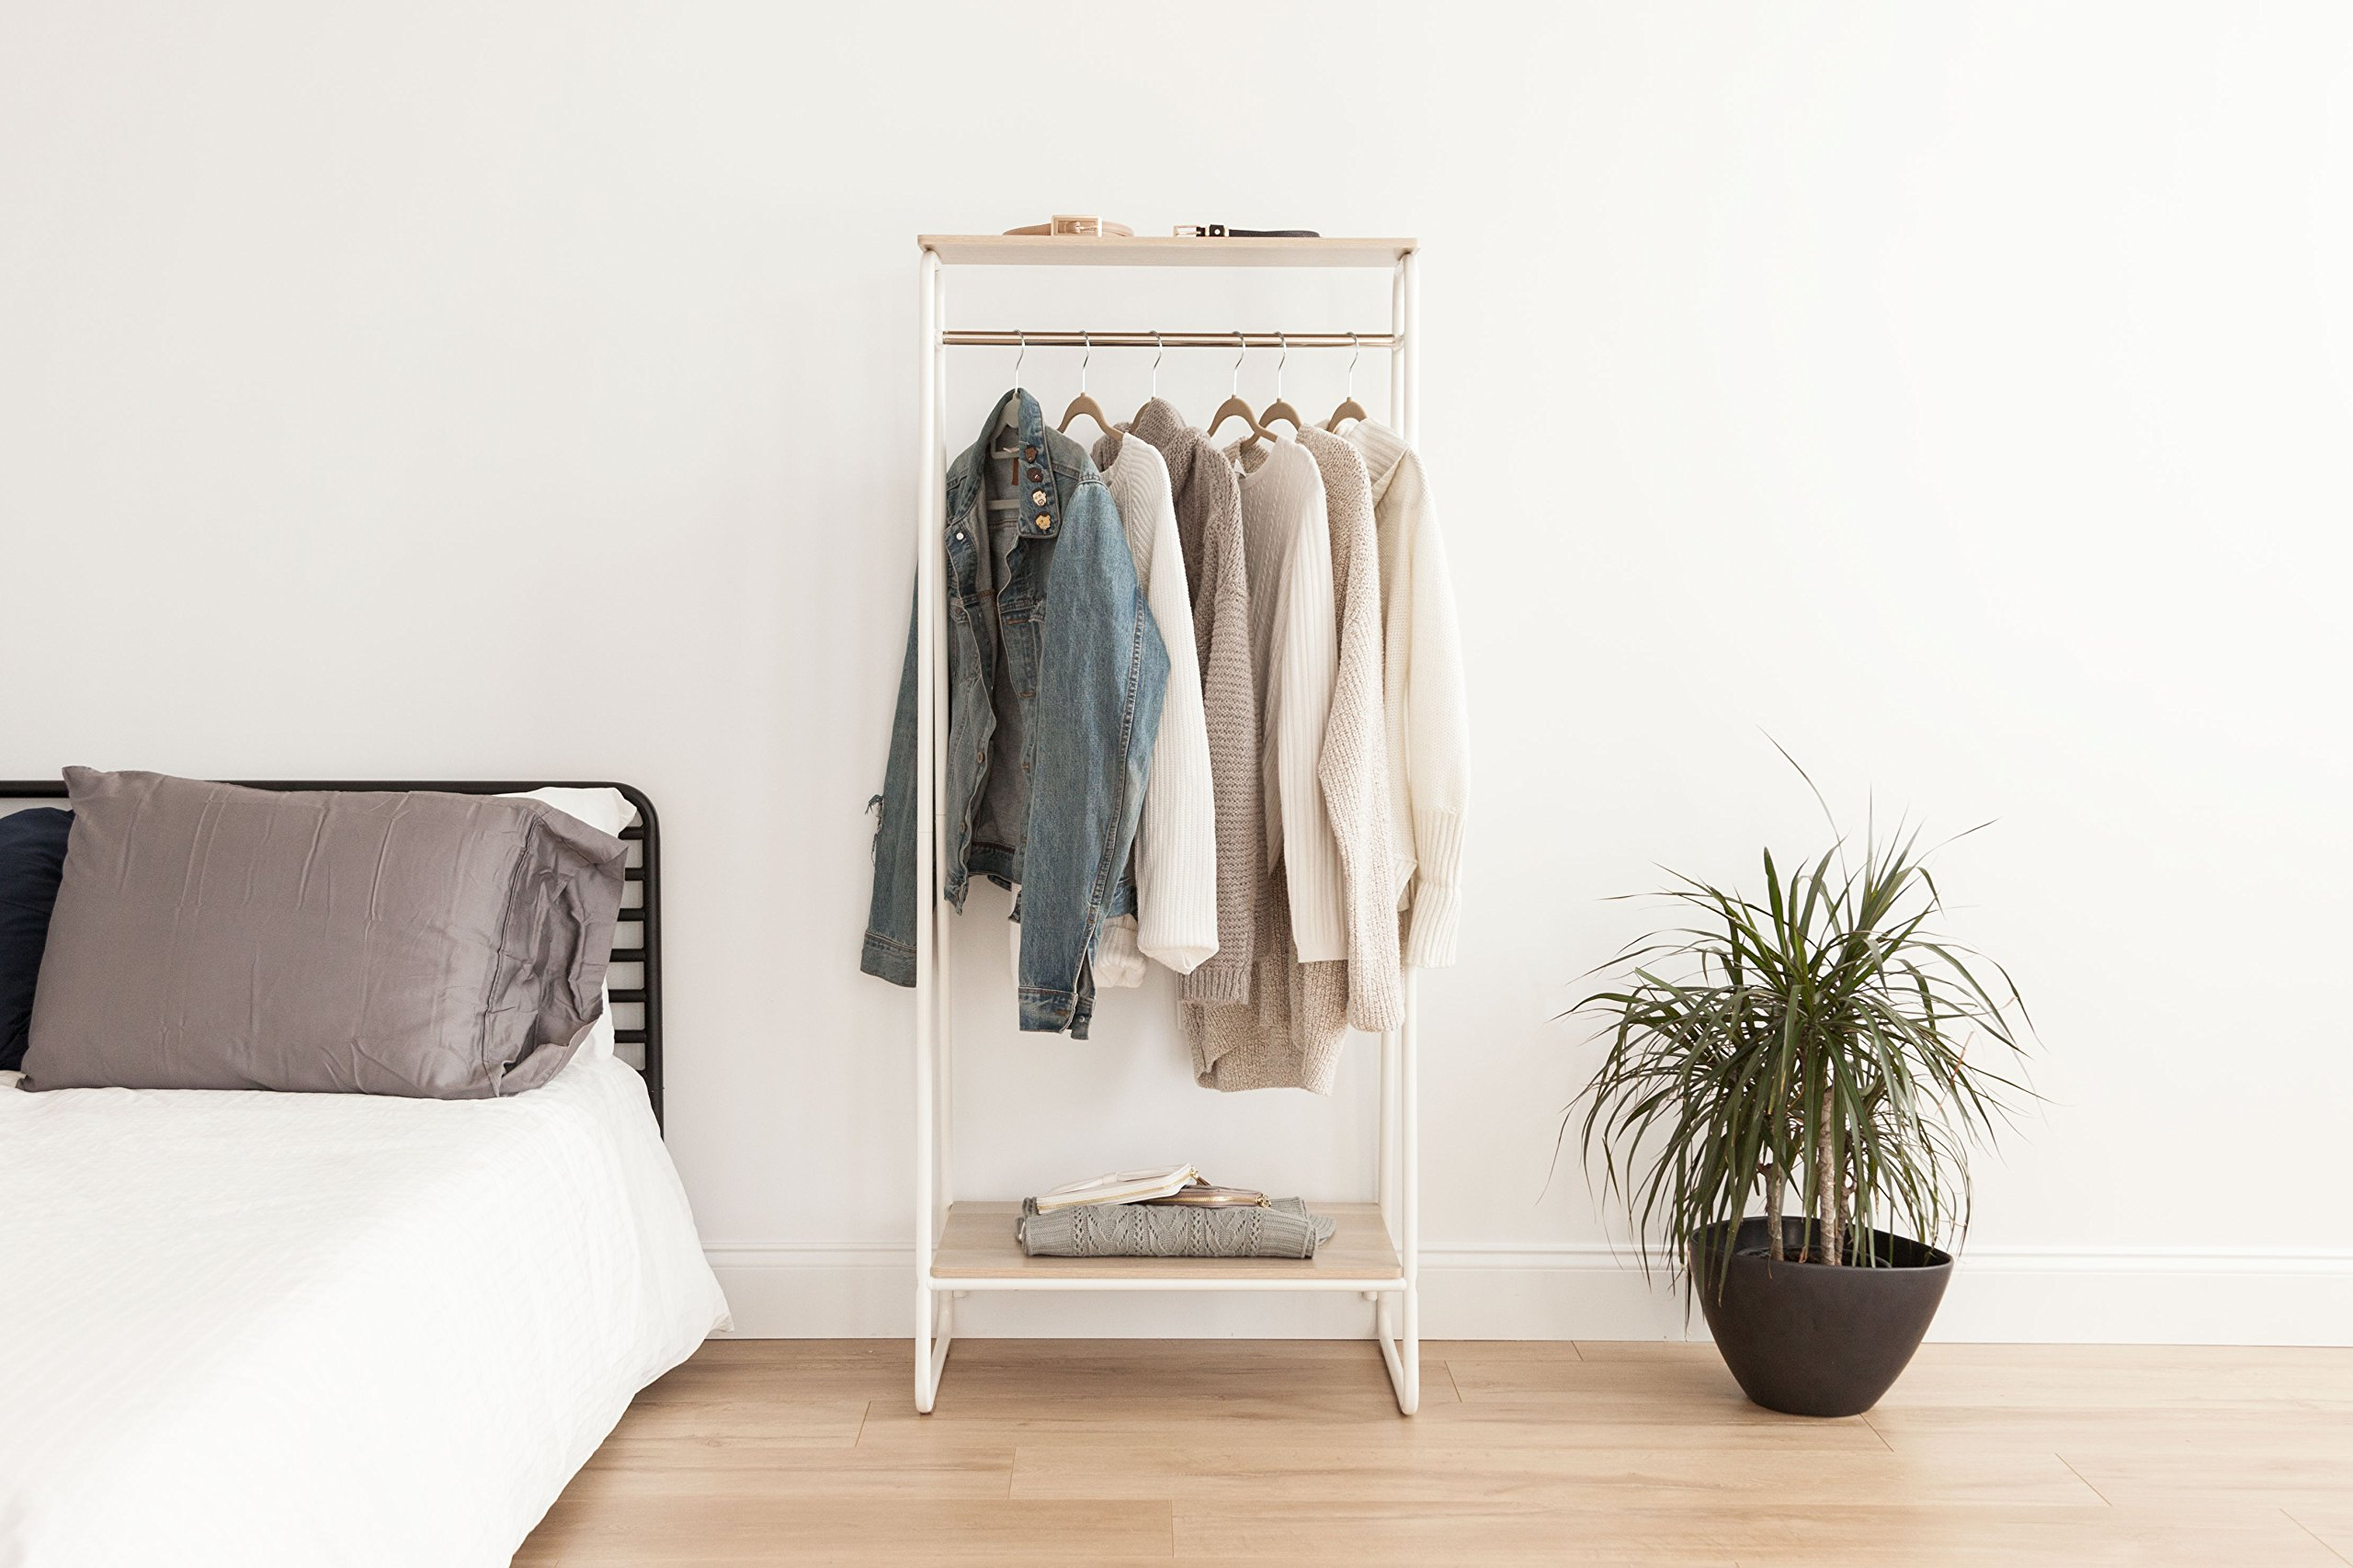 IRIS Metal Garment Rack with 2 Wood Shelves, White and Light Brown by IRIS USA, Inc. (Image #4)